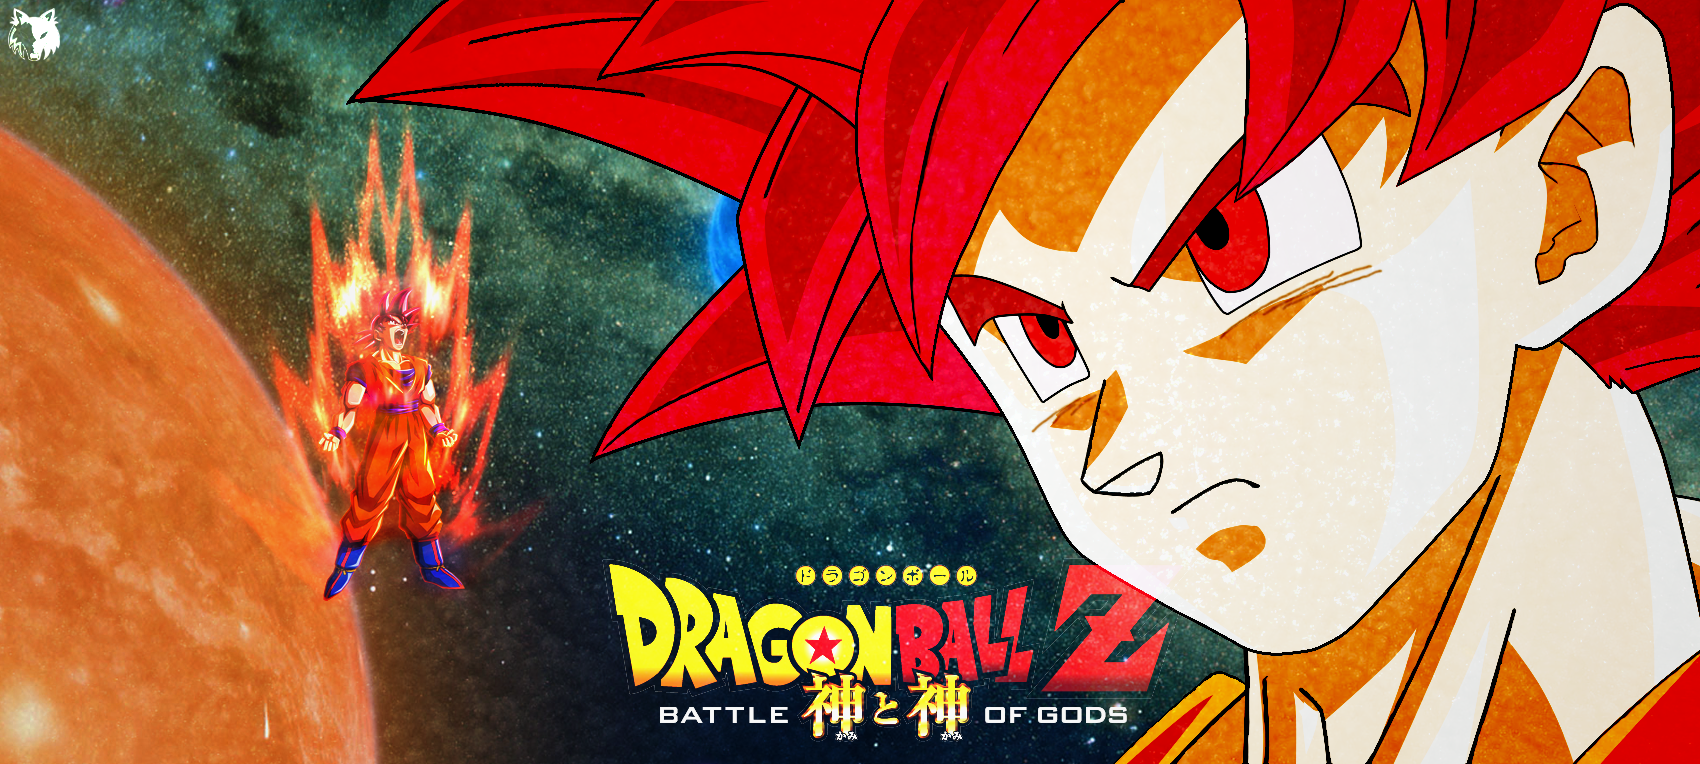 DeviantArt More Like Goku Super Saiyan God Wallpaper HD By